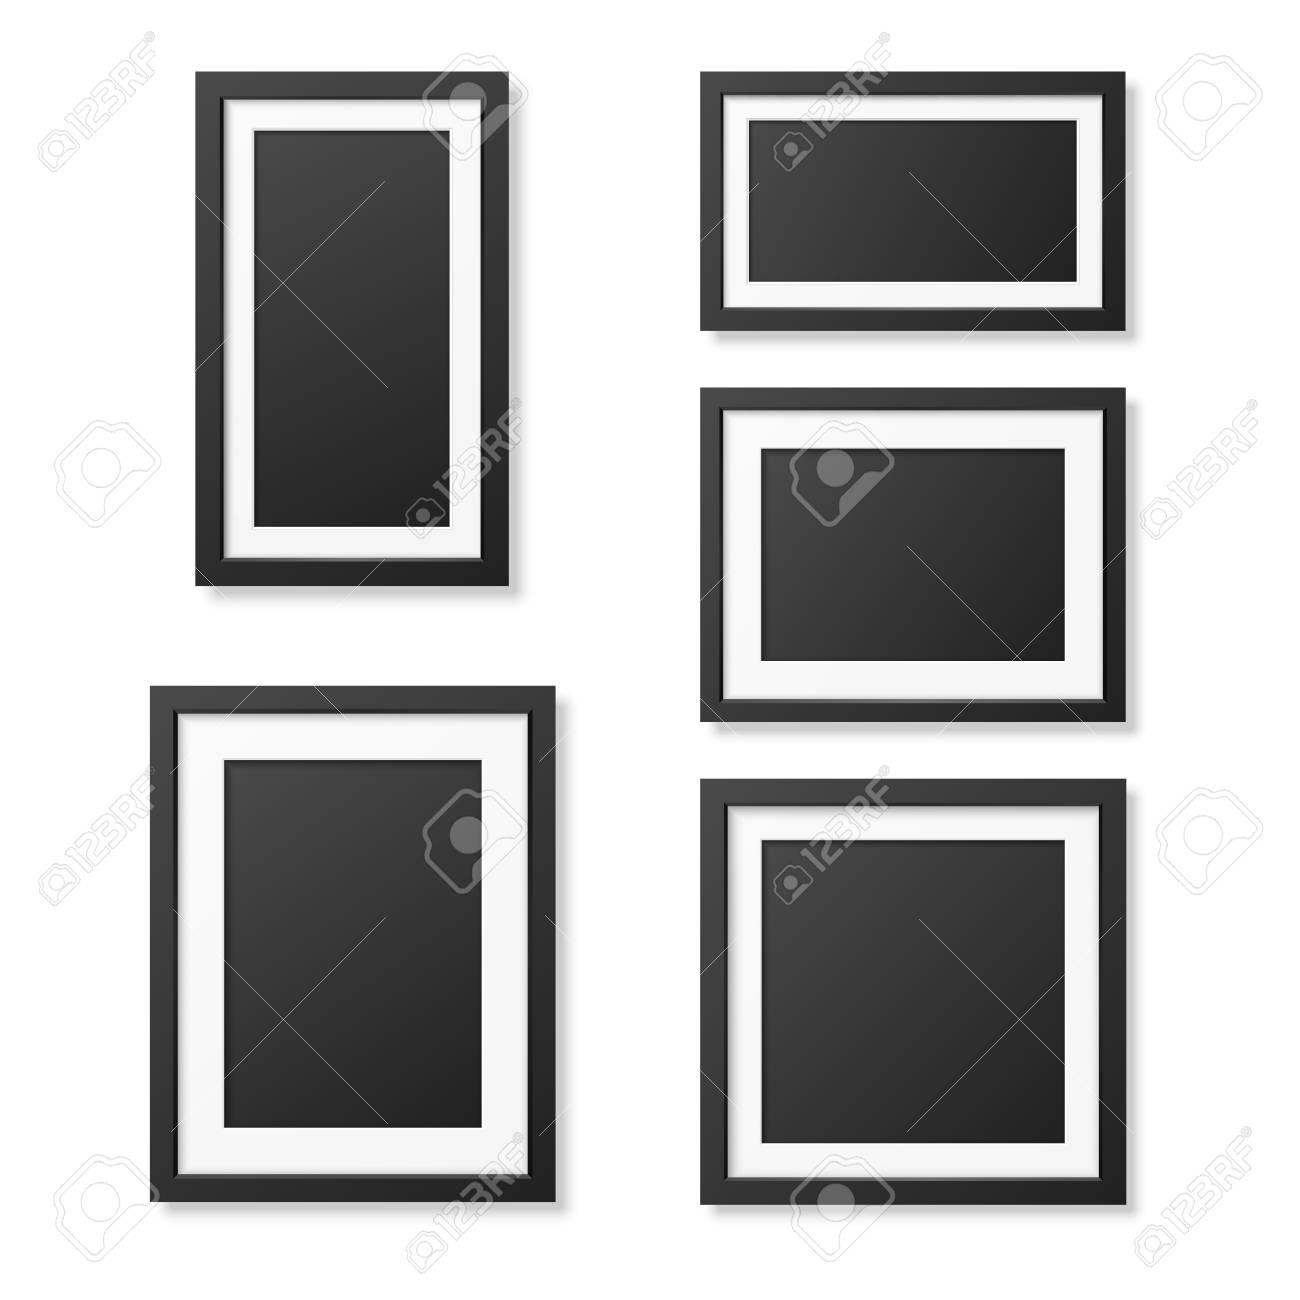 Schön 5 Dollar Bilderrahmen Fotos - Rahmen Ideen - markjohnsonshow.info